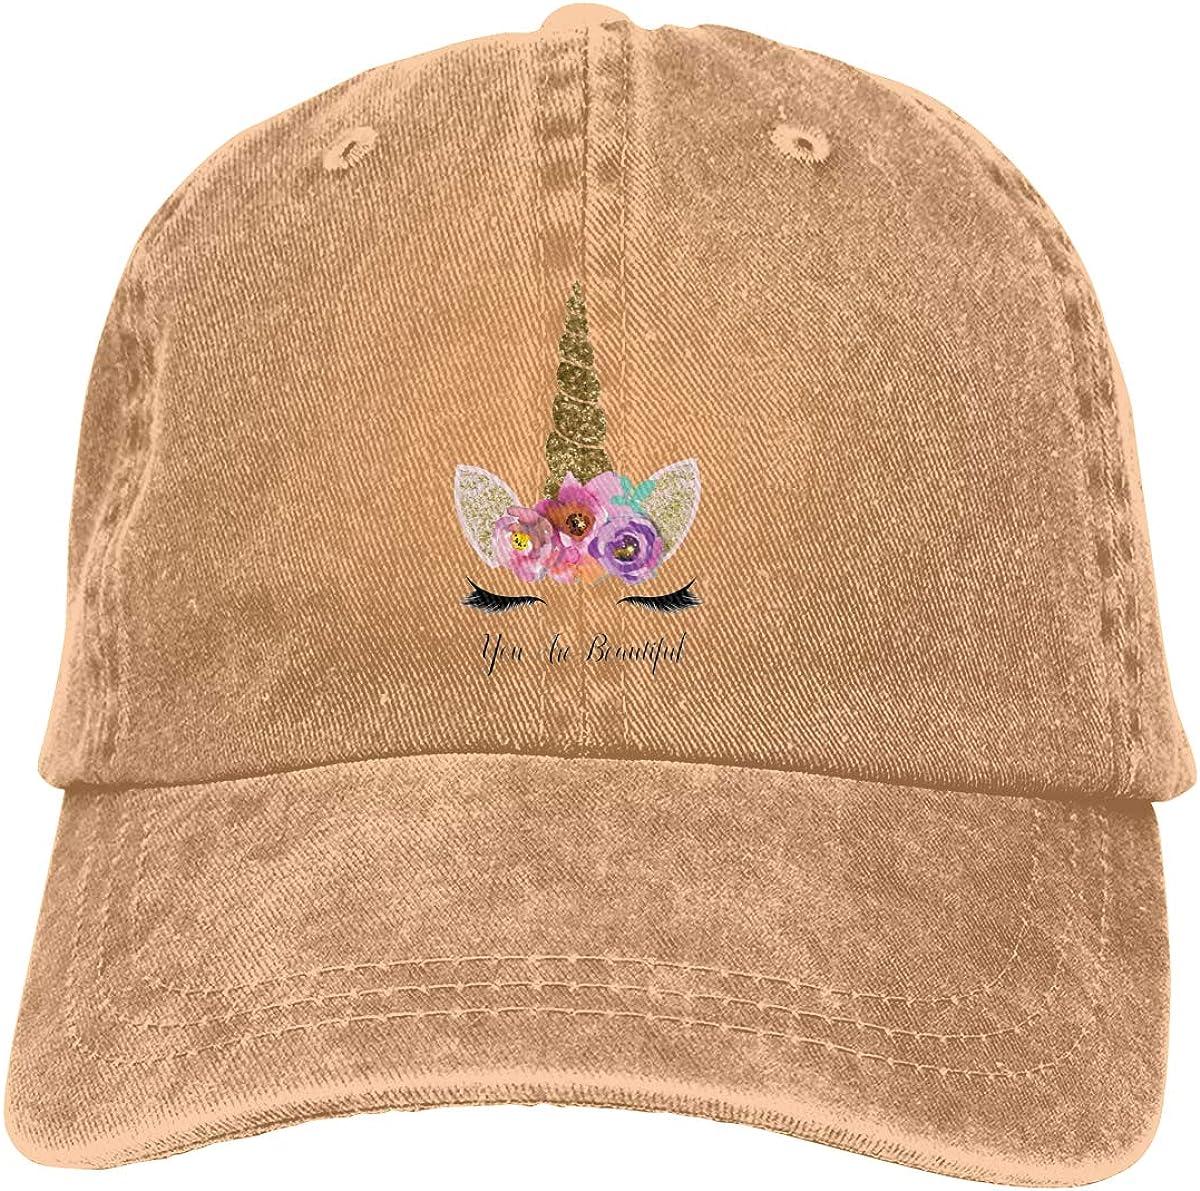 Sakanpo Unicorn Gold Glitter Girly Girls Unisex Cowboy Baseball Caps Trucker Hats Gray